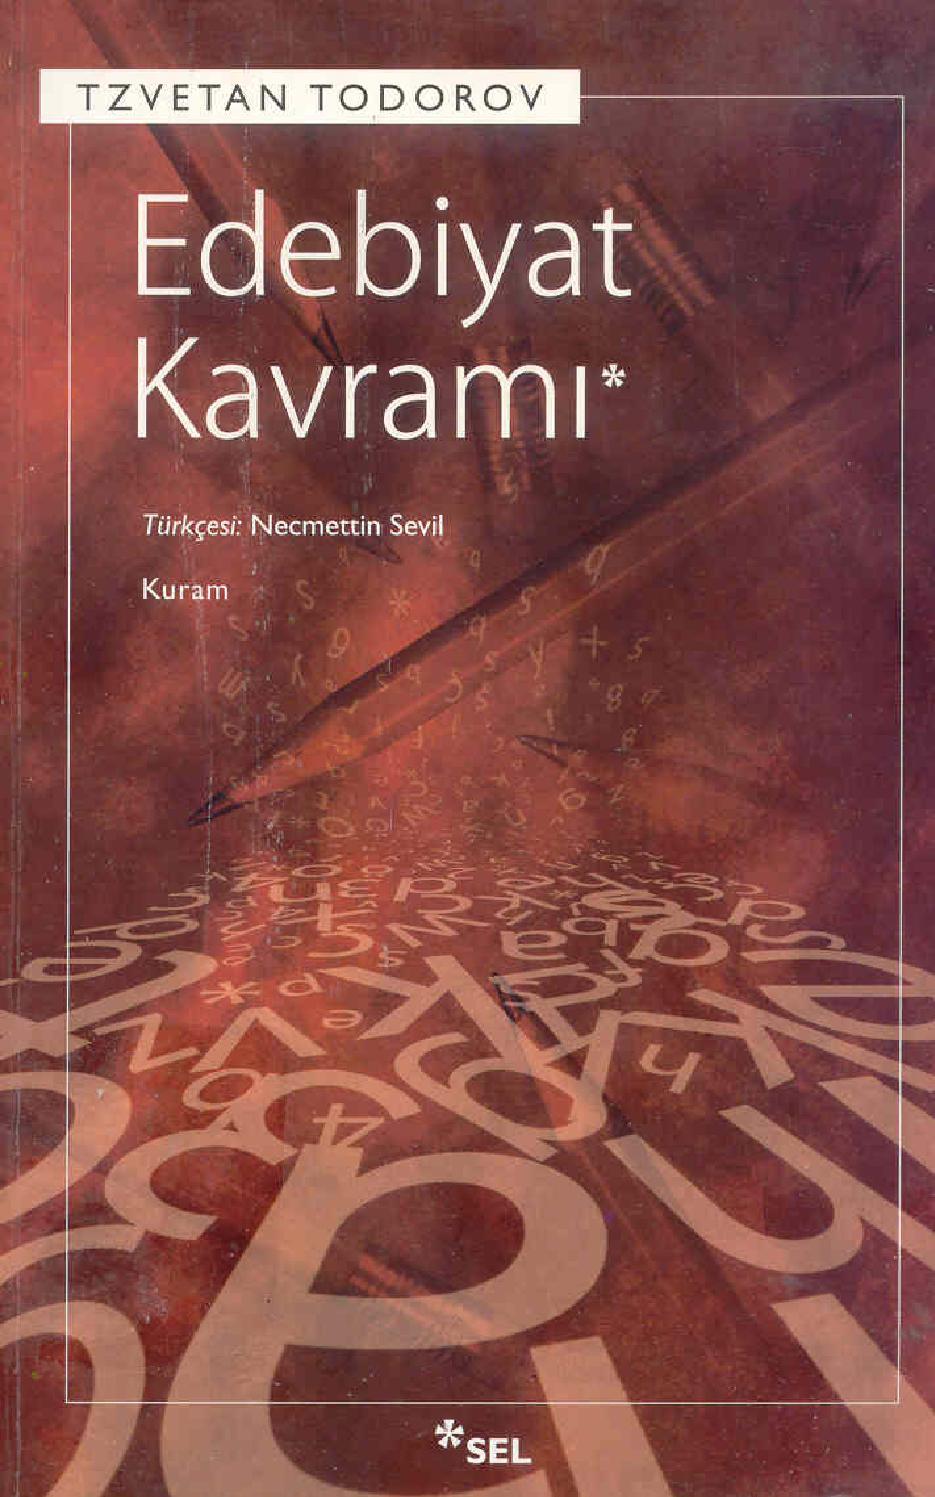 Tzvetan Todorov Edebiyat Kavramı By Hüseyin Şenol - Issuu destiné Labyrinthe Difficile